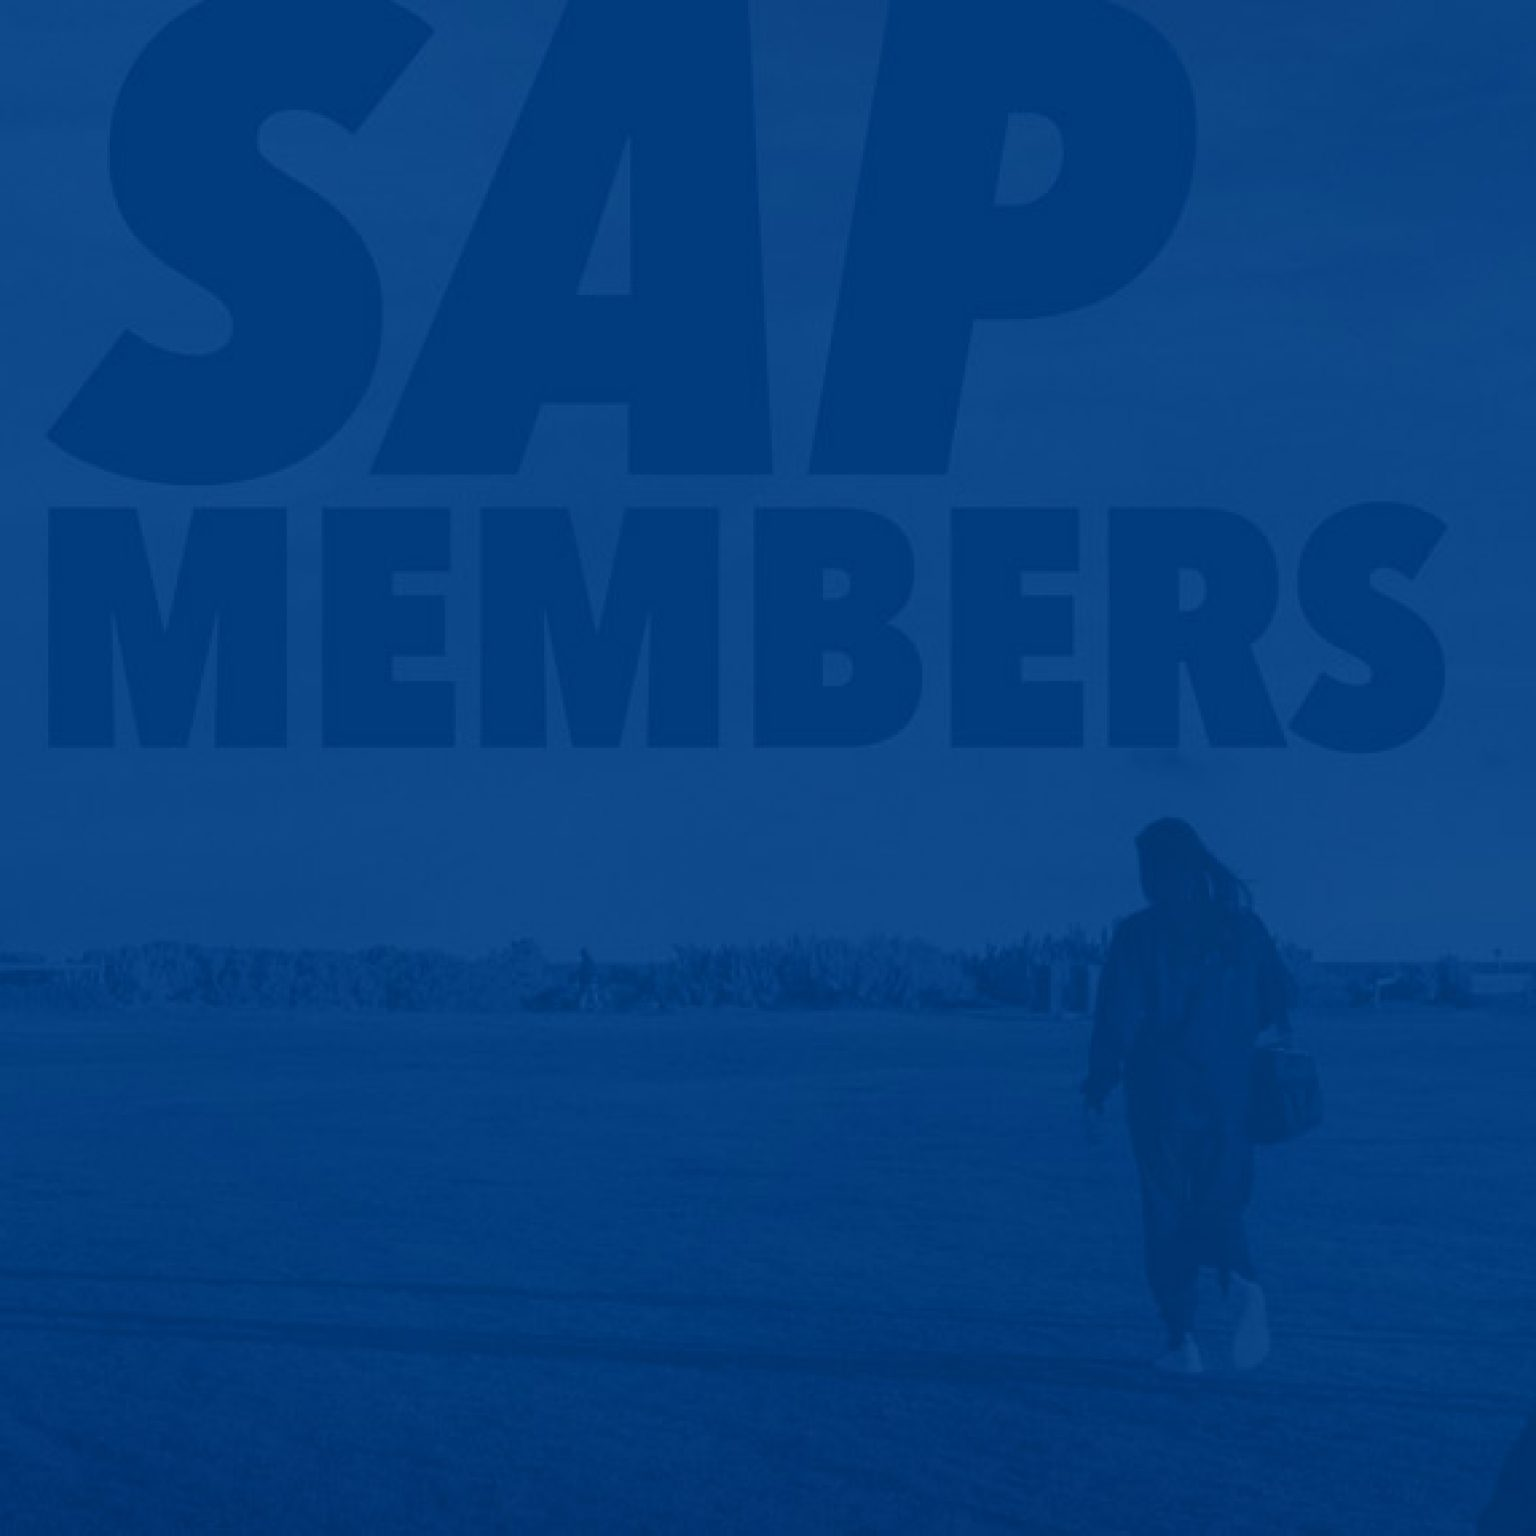 Announcing the 2021 Springtide Ambassadors Program Members